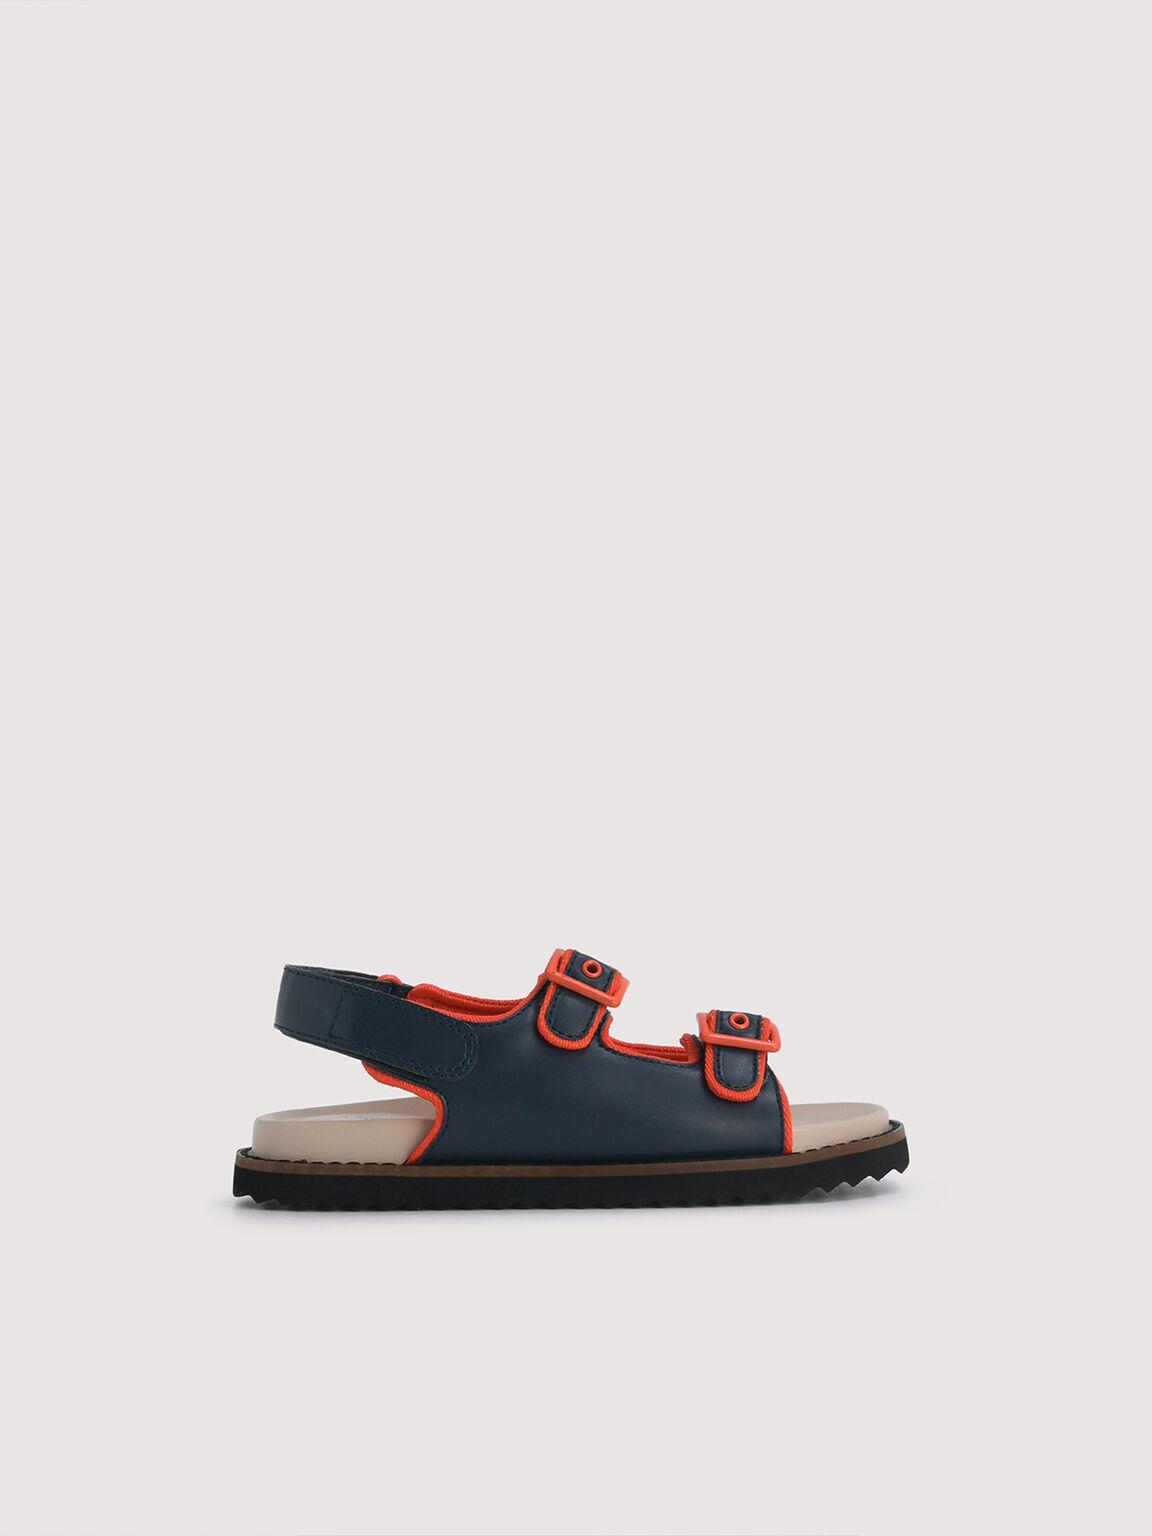 Slingback Sandals, Navy, hi-res